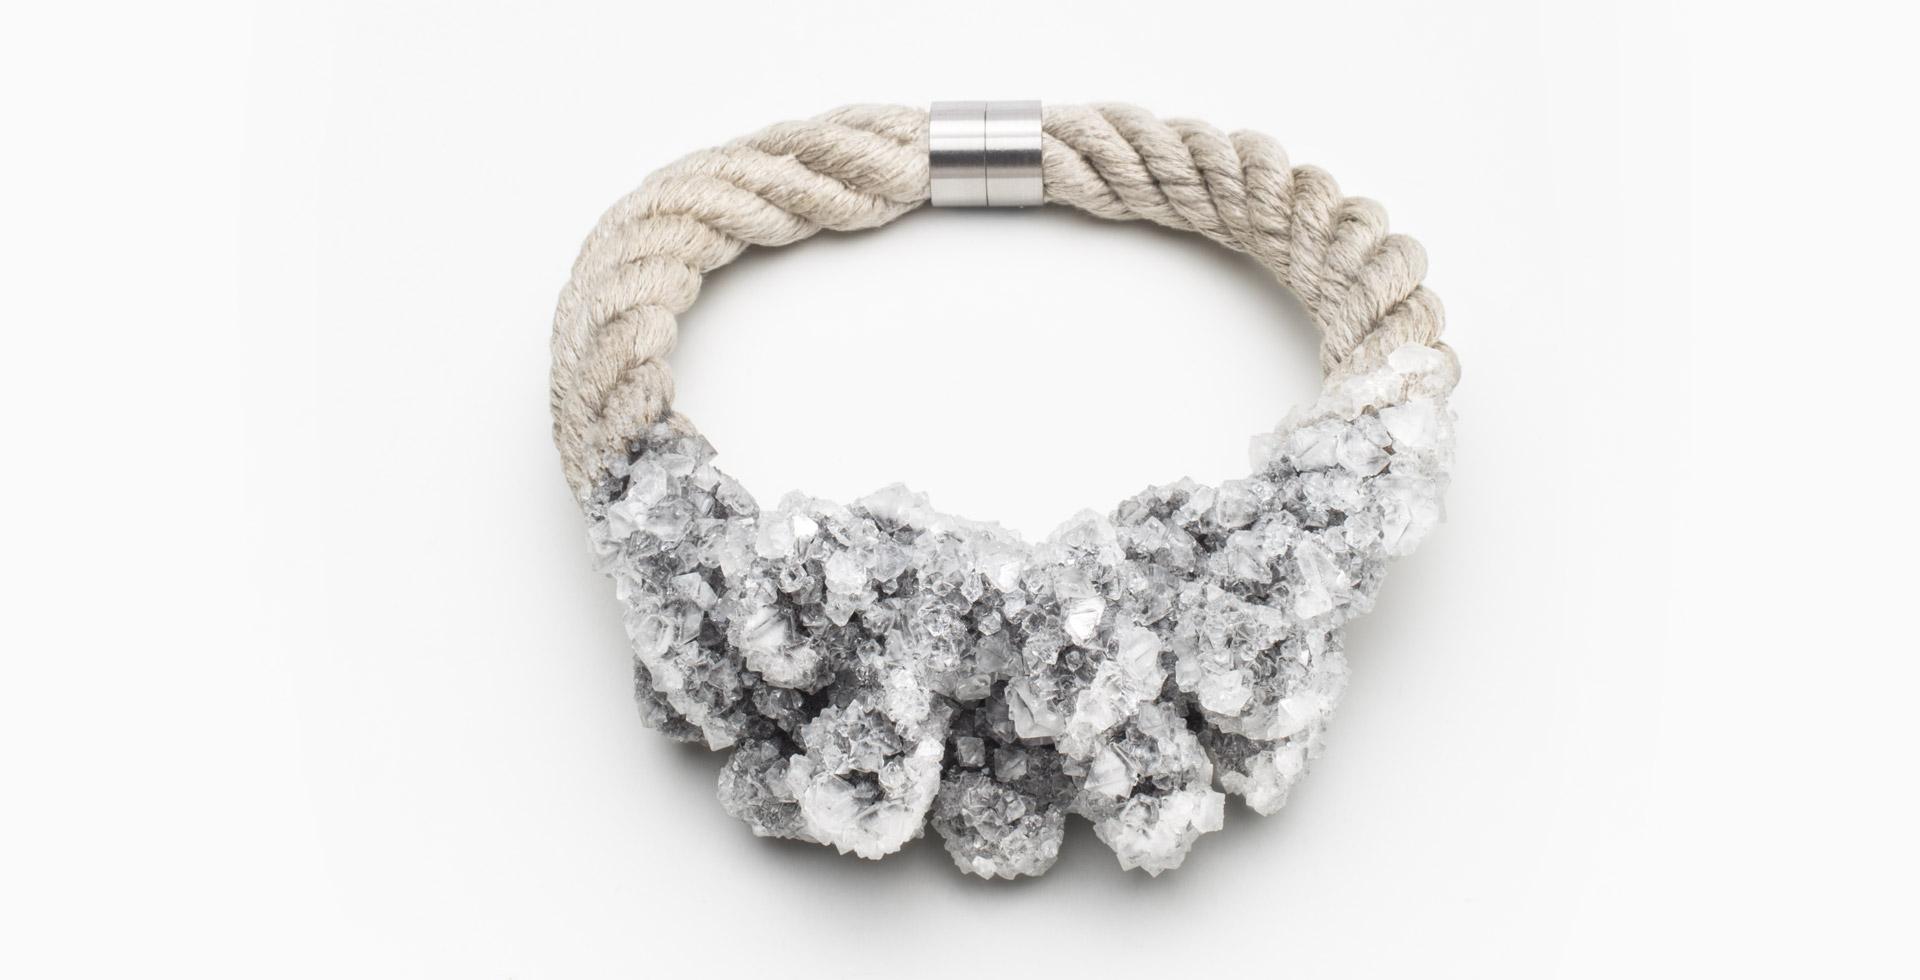 Šperk z kolekce Virus